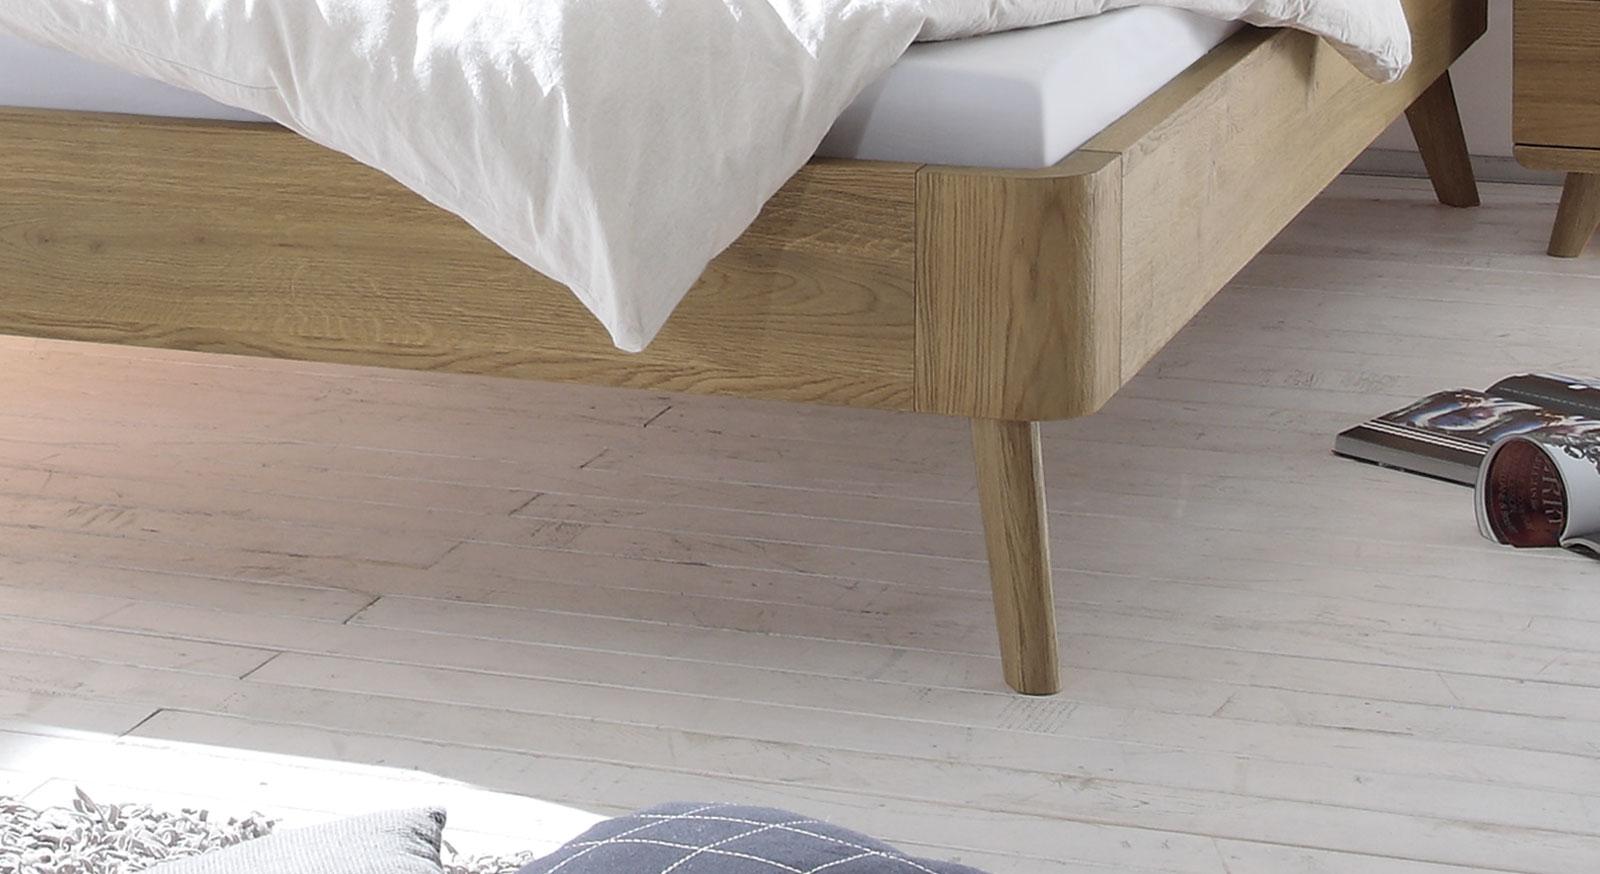 Holzbett Teko mit modernen Bettbeinen